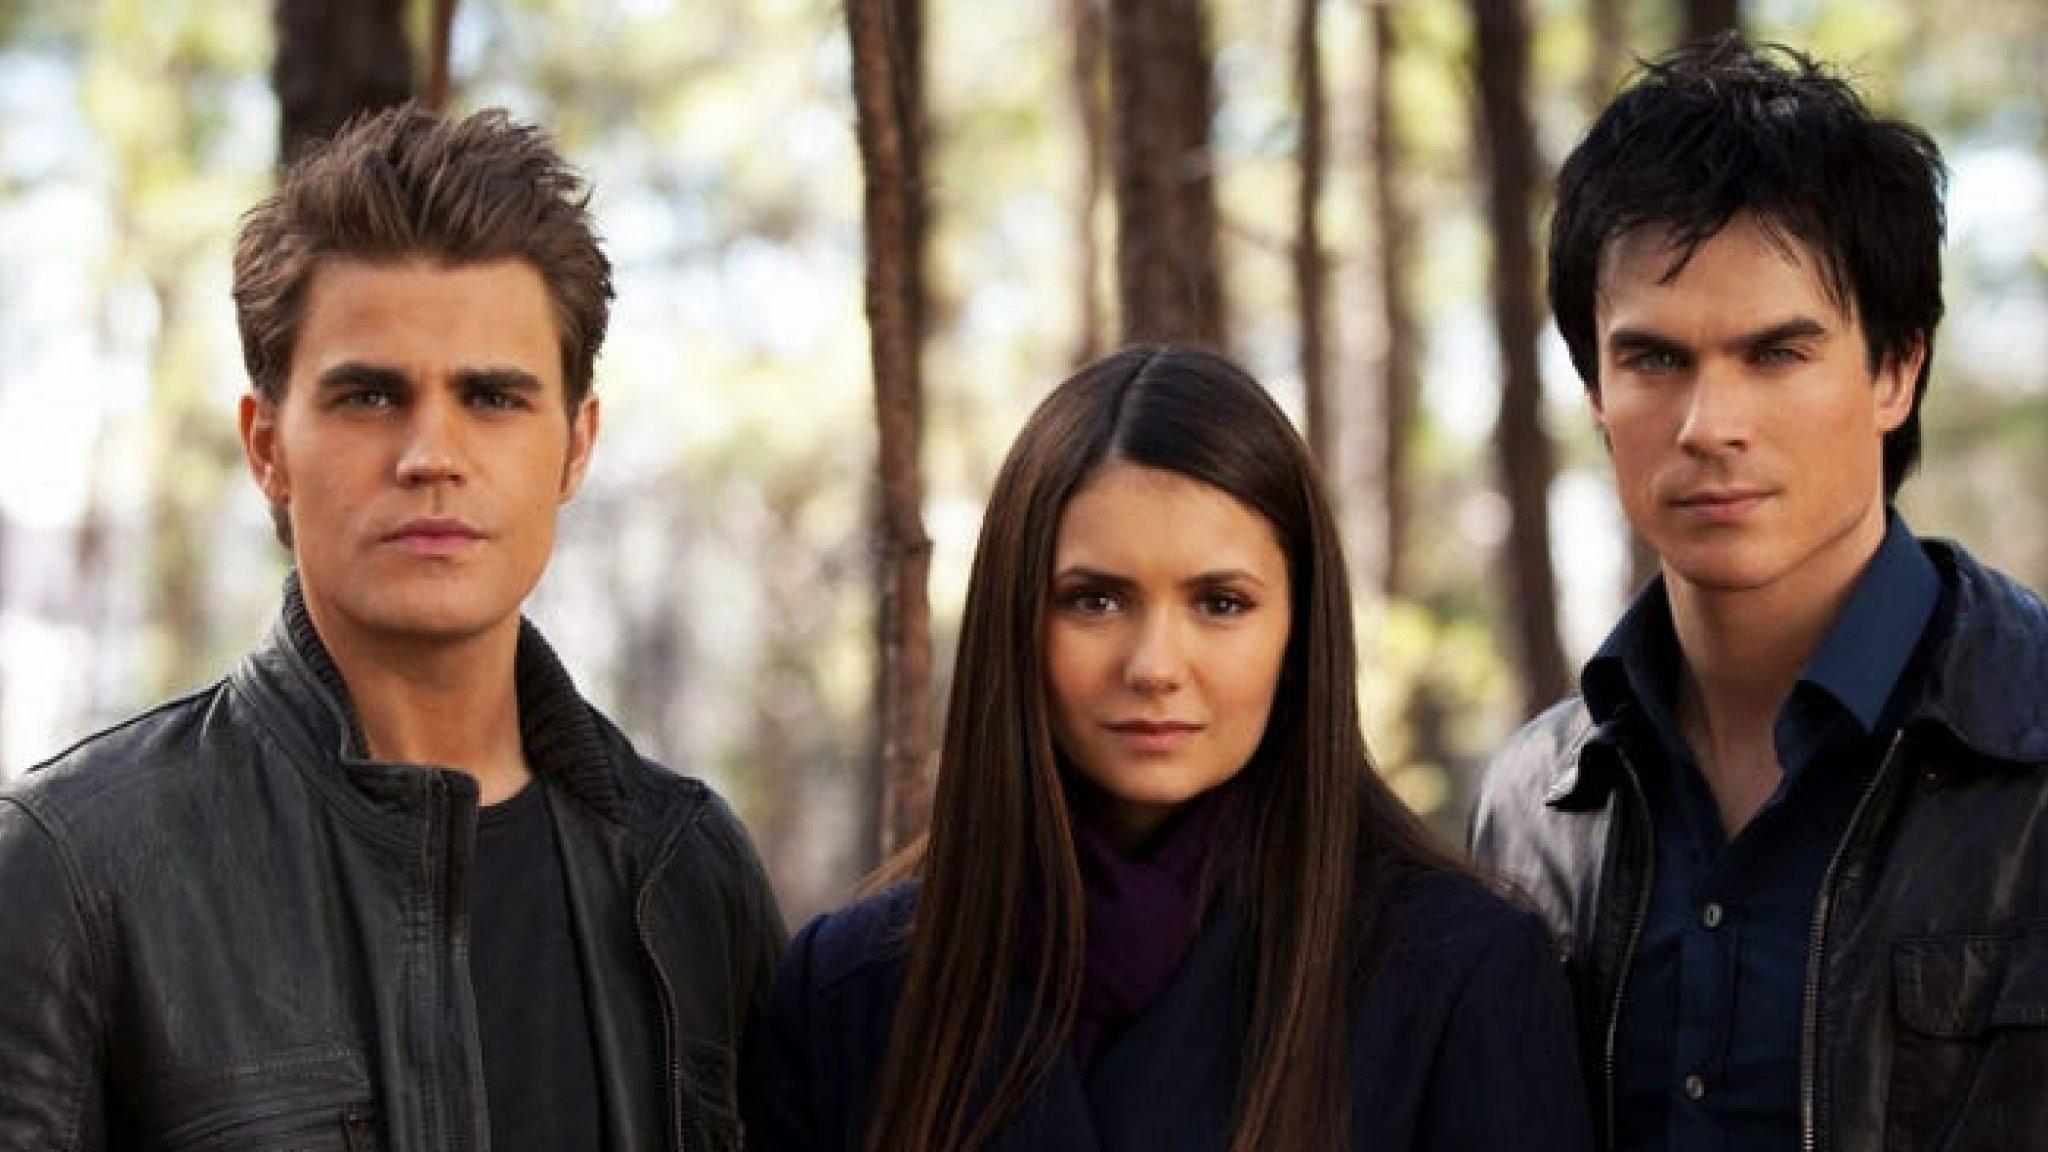 De tandjes! Netflix verwijdert álle seizoenen The Vampire Diaries - RTL Boulevard